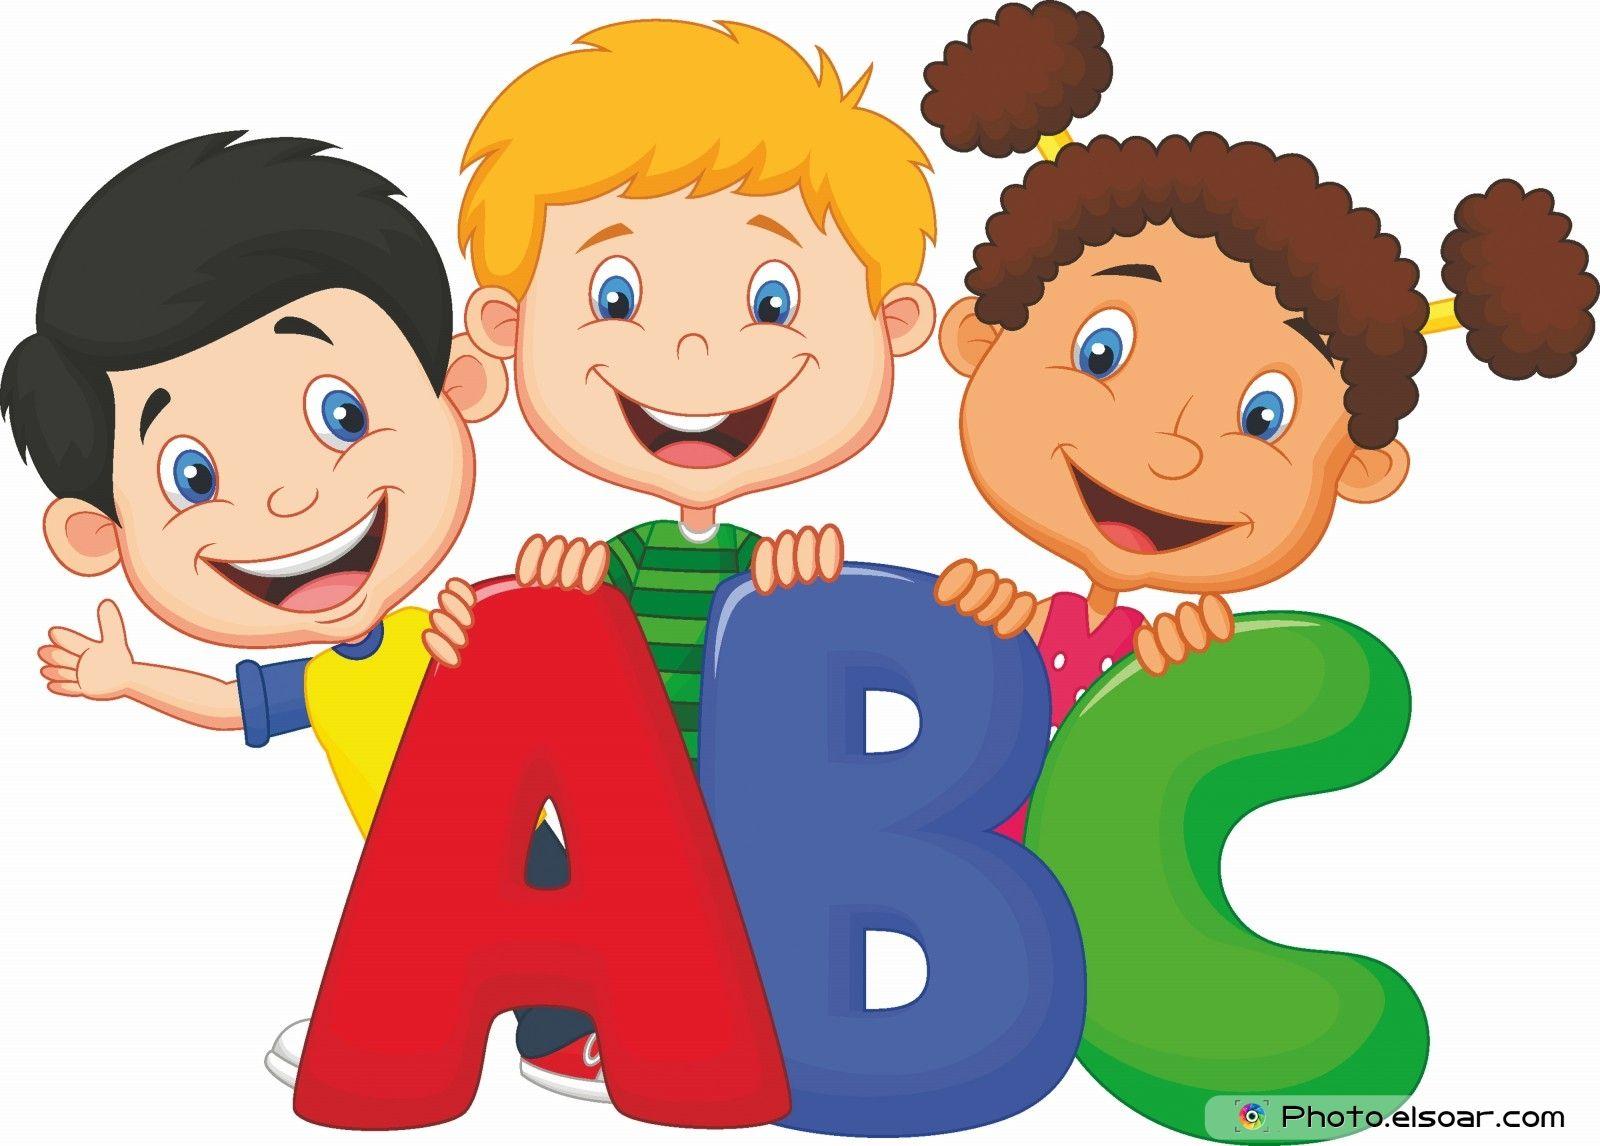 Abc clipart elementary school. Cartoon kid acur lunamedia